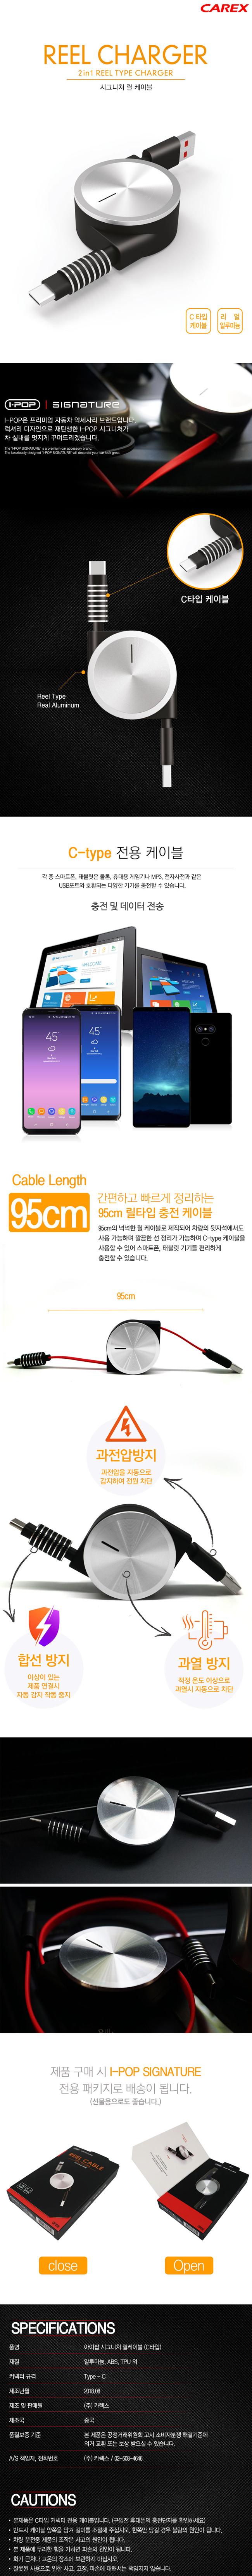 [CAREX] 아이팝 시그니처 릴케이블 (95cm) - C타입